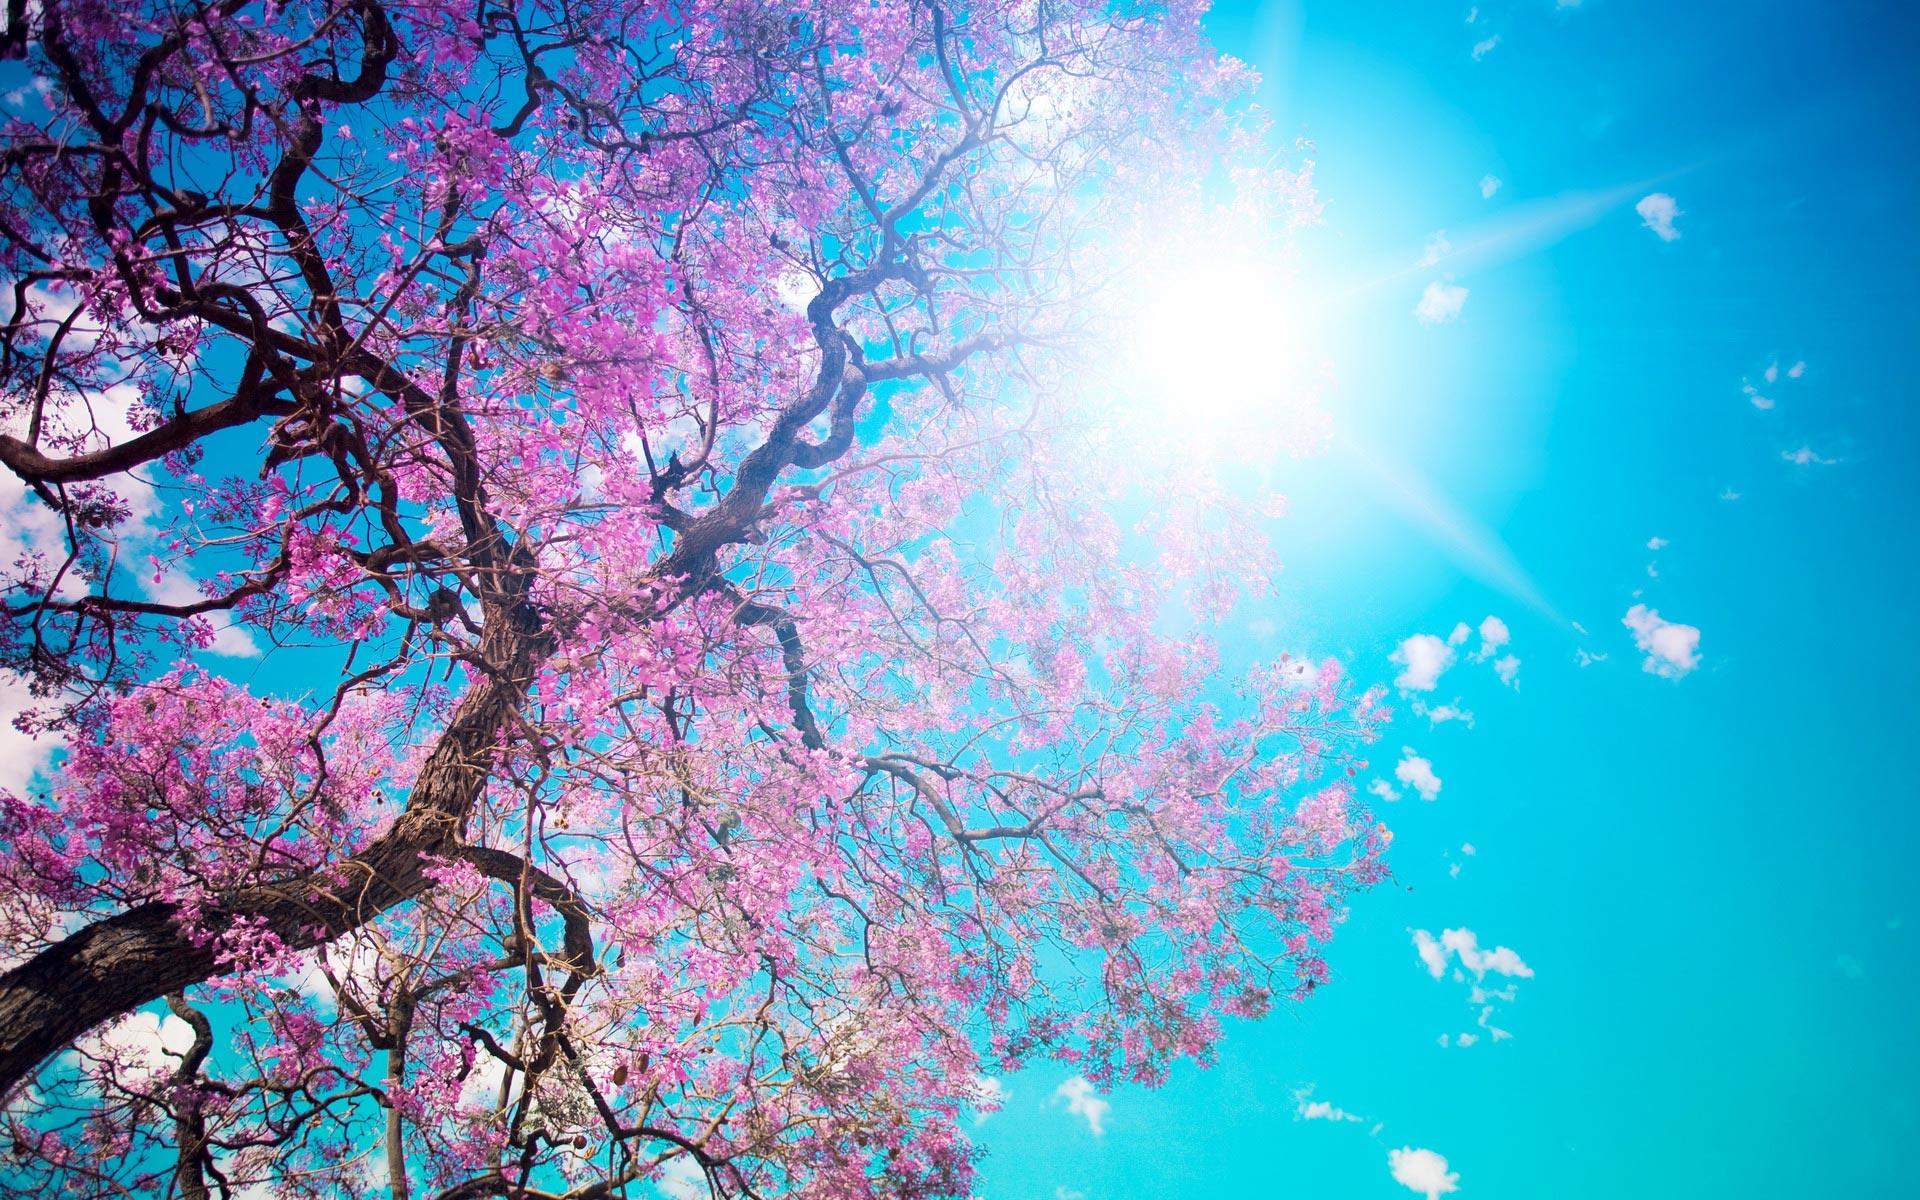 Iphone 5 Wallpaper Hd Retina Display Blooming Spring Wallpapers Hd Wallpapers Id 10620